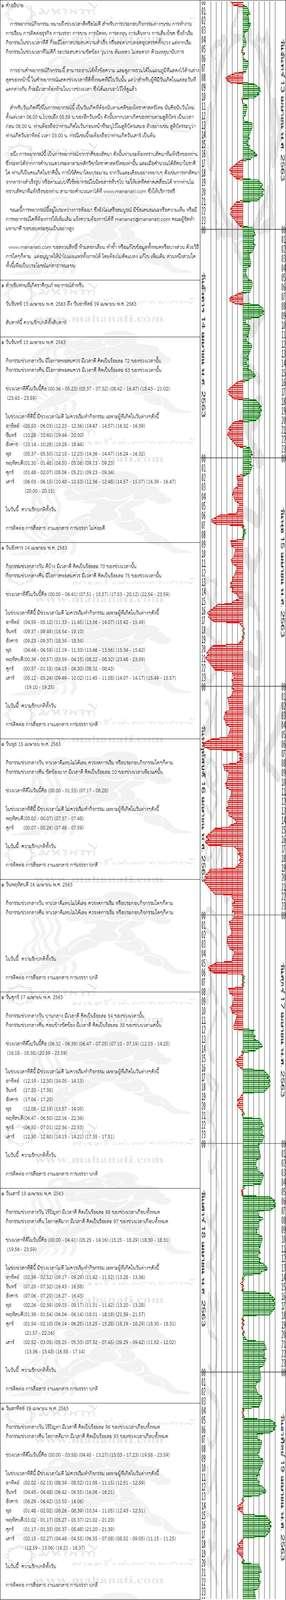 q8gfrl1cl77x3HqMC3P-o.jpg